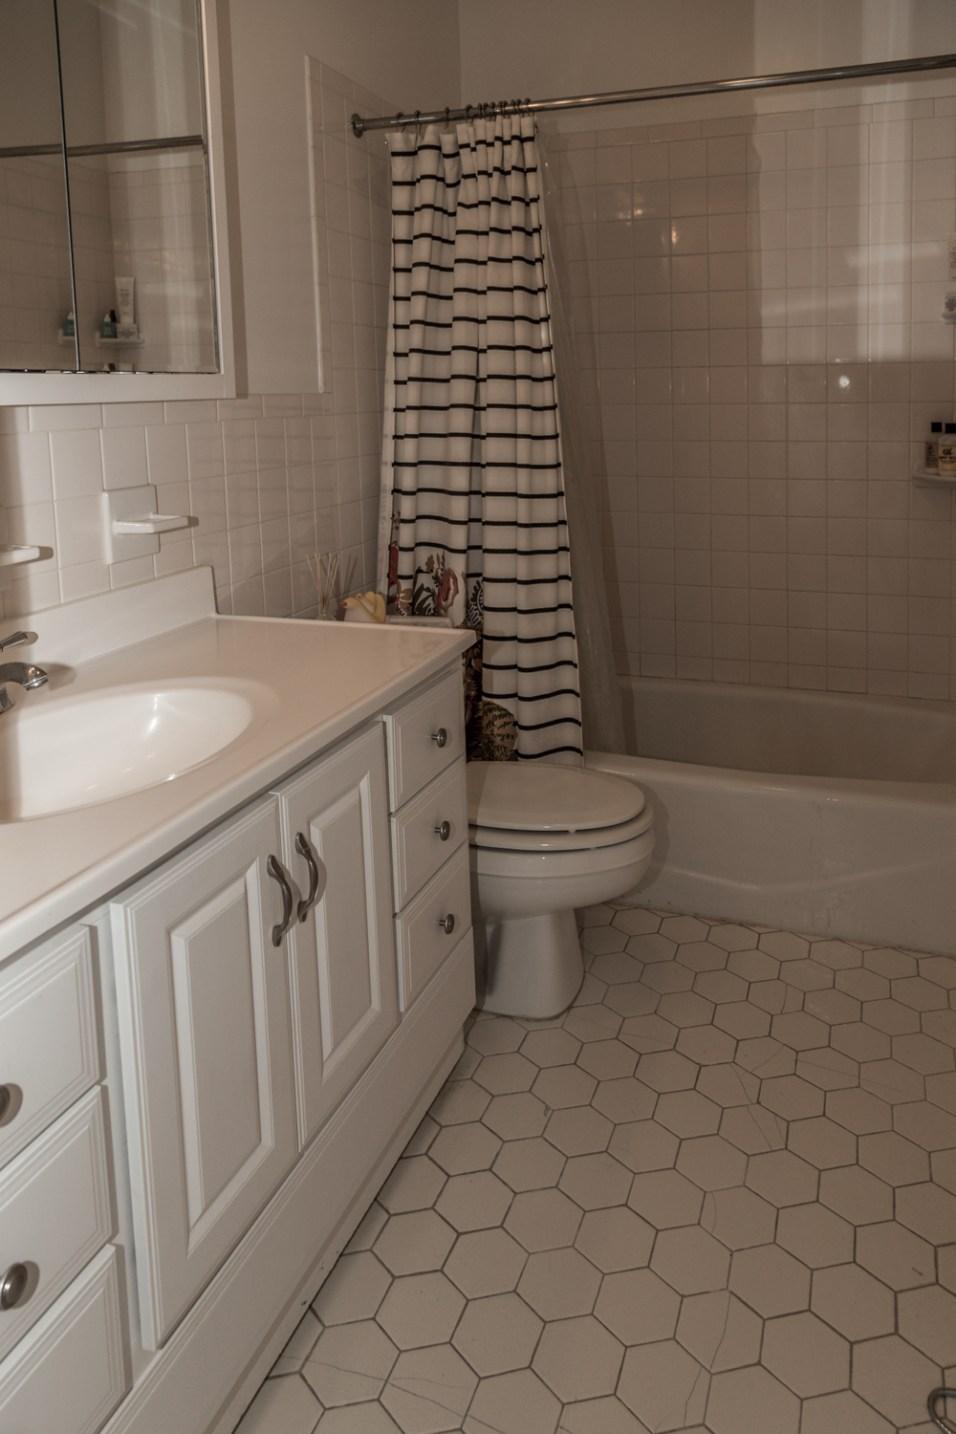 736 Garden St Apt D - bathroom